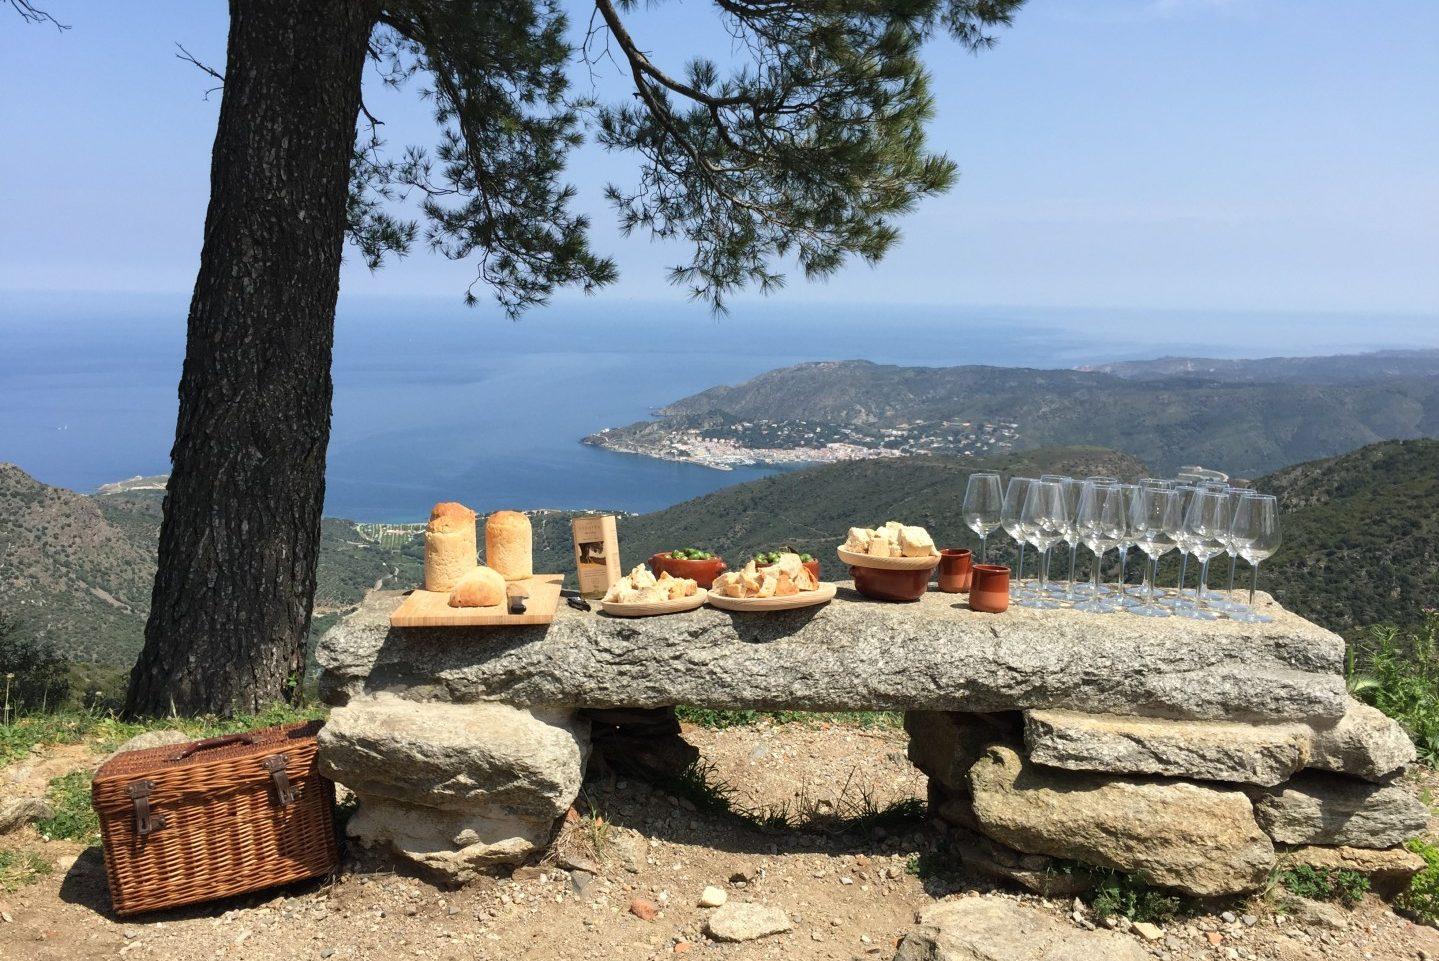 Spain, Catalonia, Cap de Creus, Sant Pere de Rodos Monastery, local produce tasting, food tour NCN